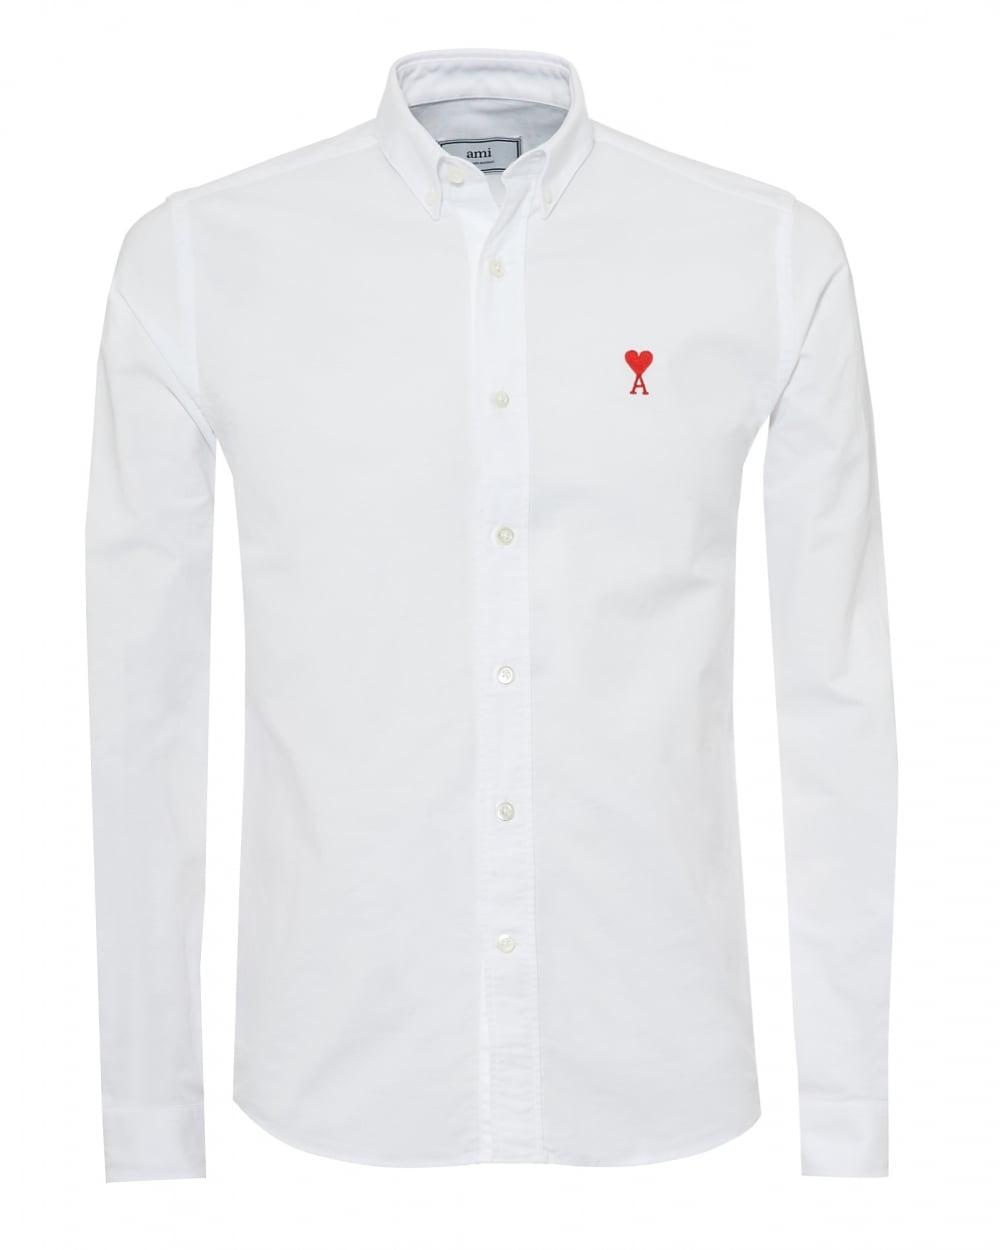 386778b3636 Ami Mens Embroidered Heart Logo Shirt